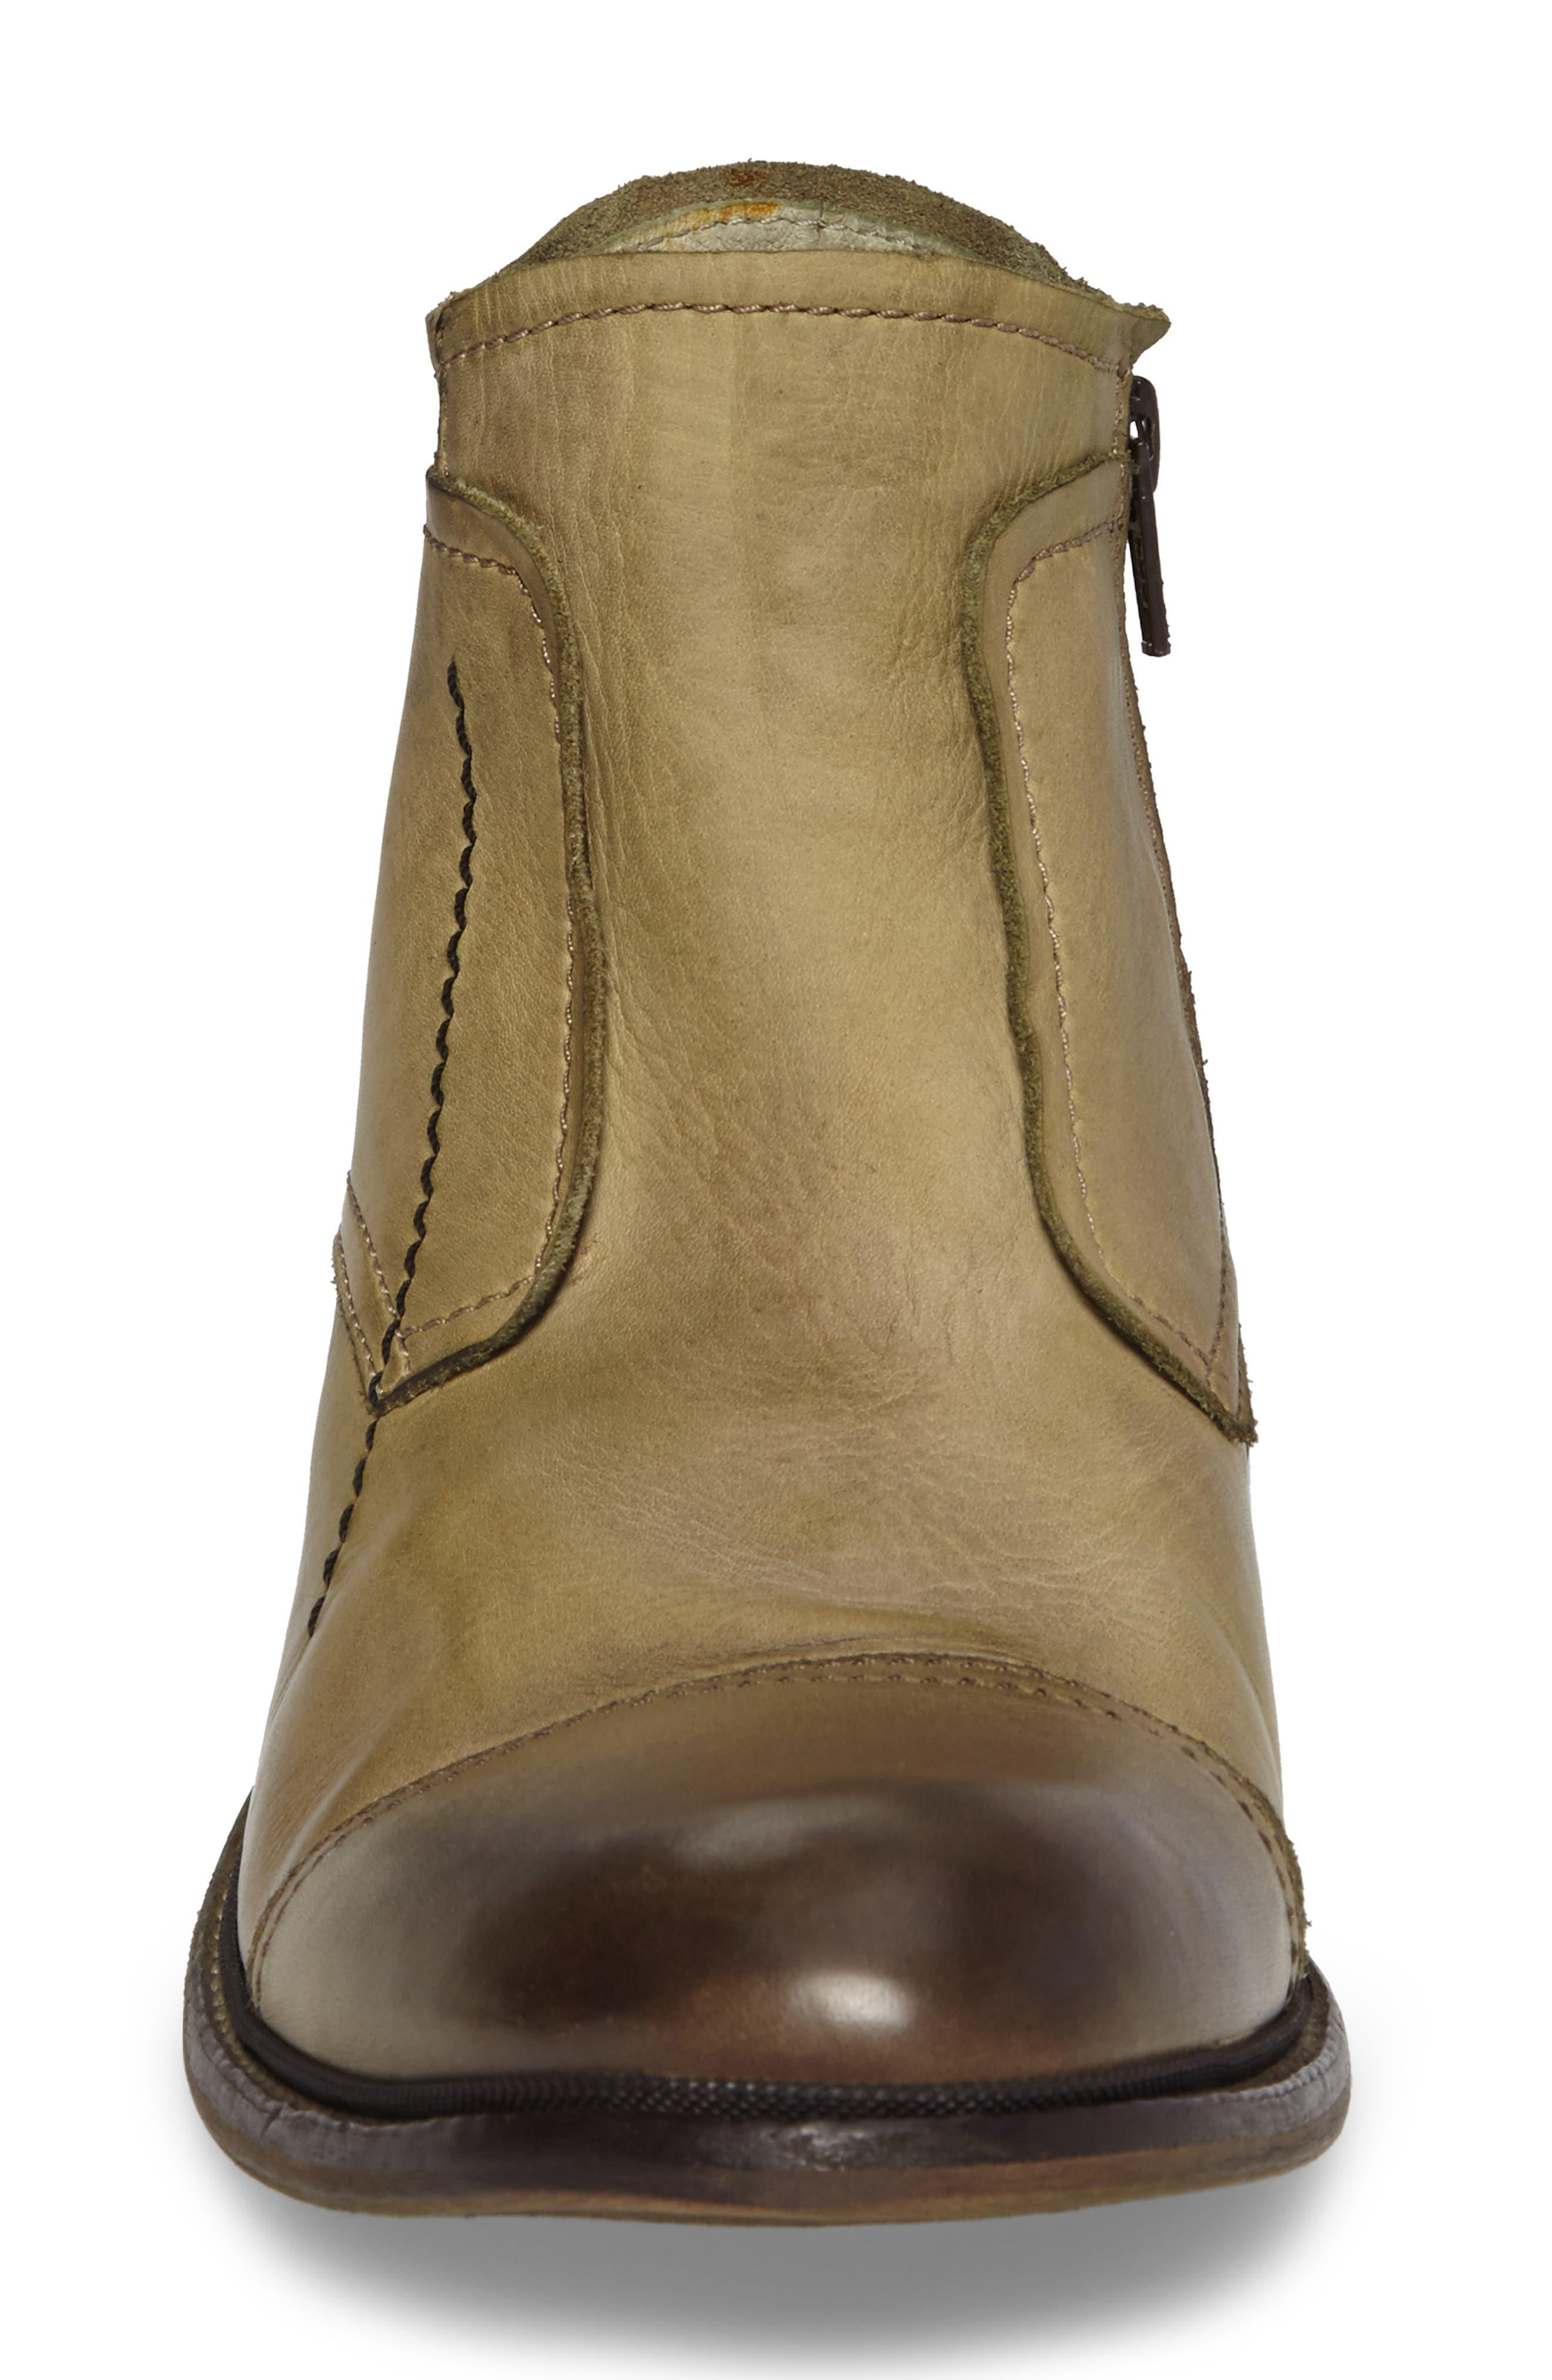 Hale Low Cap Toe Boot,                             Alternate thumbnail 5, color,                             Salvia